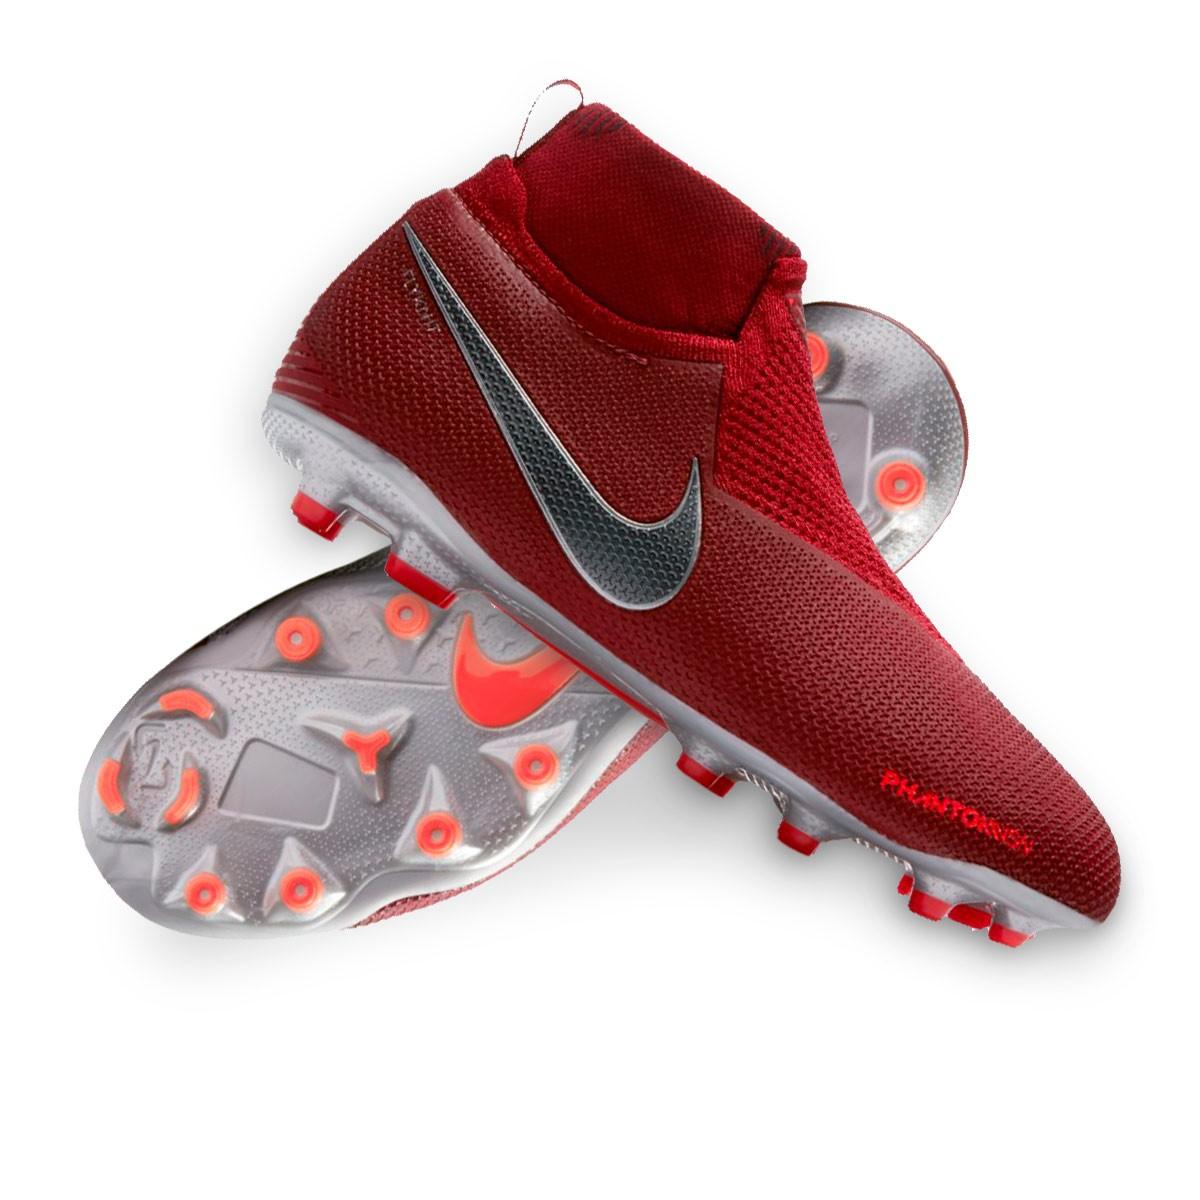 59c8bdc2a Football Boots Nike Kids Phantom Vision Elite DF MG Team red-Metallic dark  grey-Bright crimson - Tienda de fútbol Fútbol Emotion